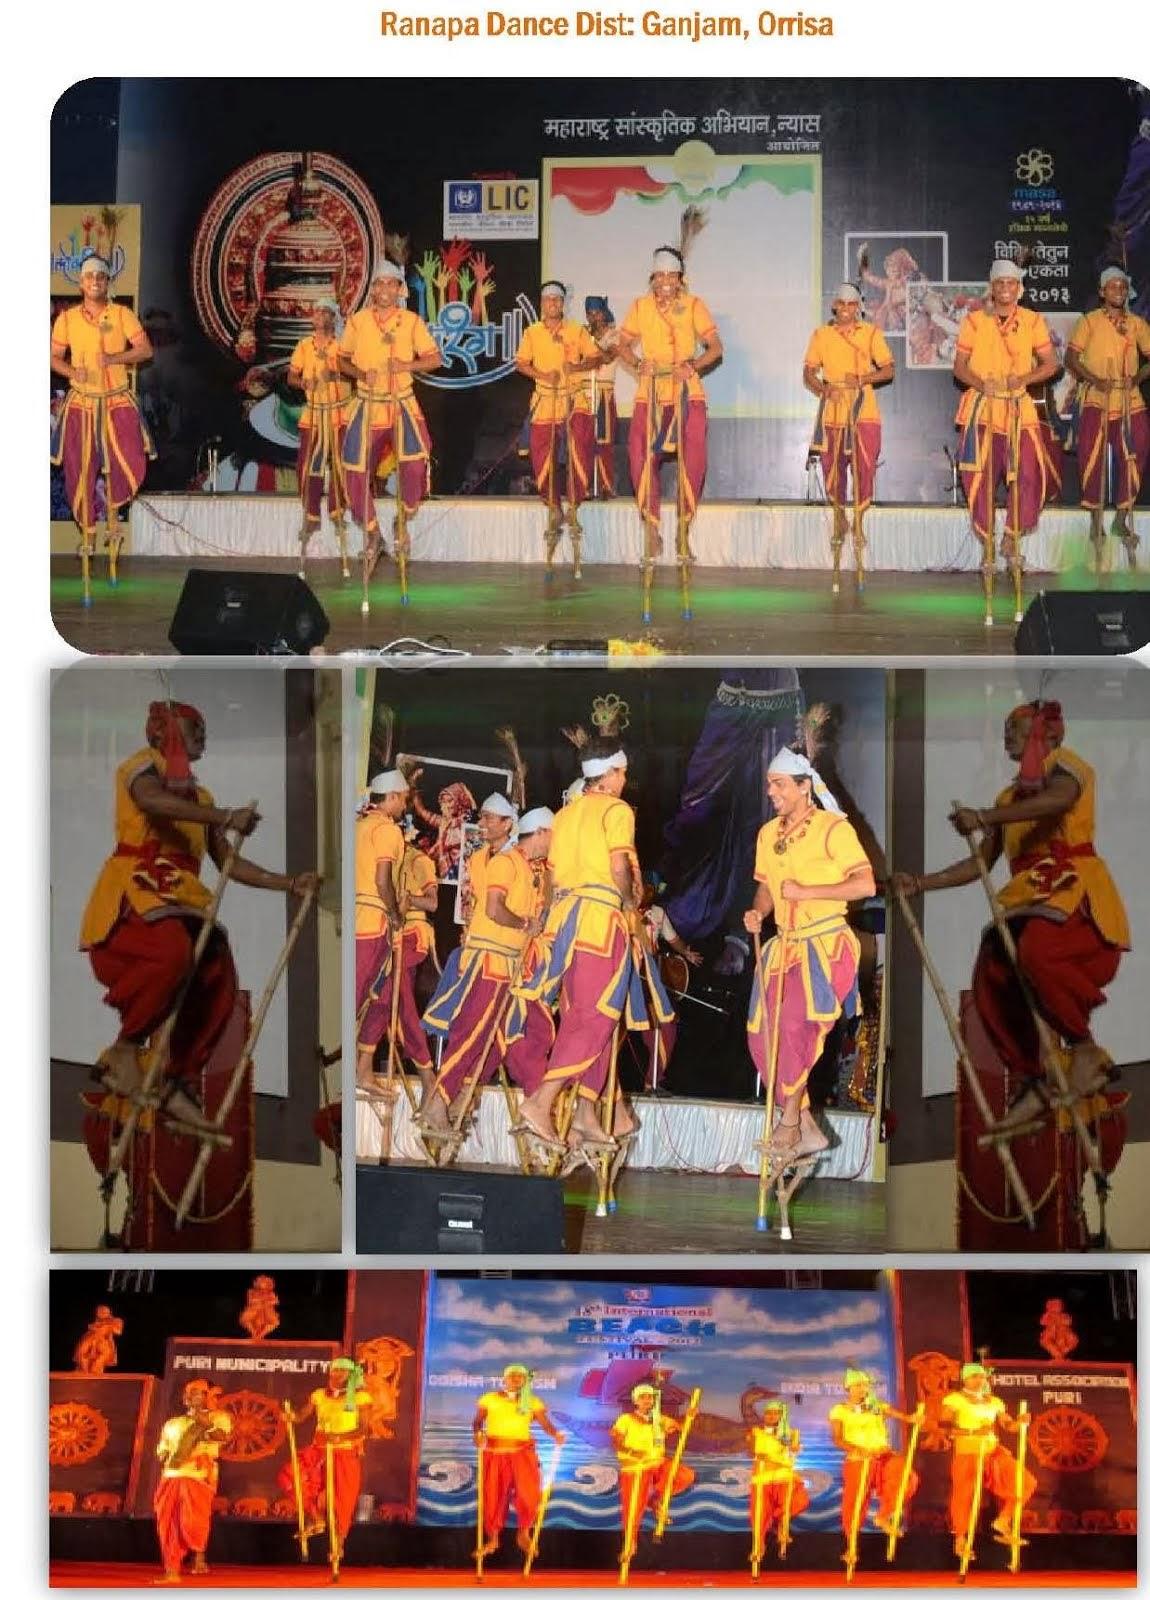 Ranapa Folk dance, Ganjama-Orriasa